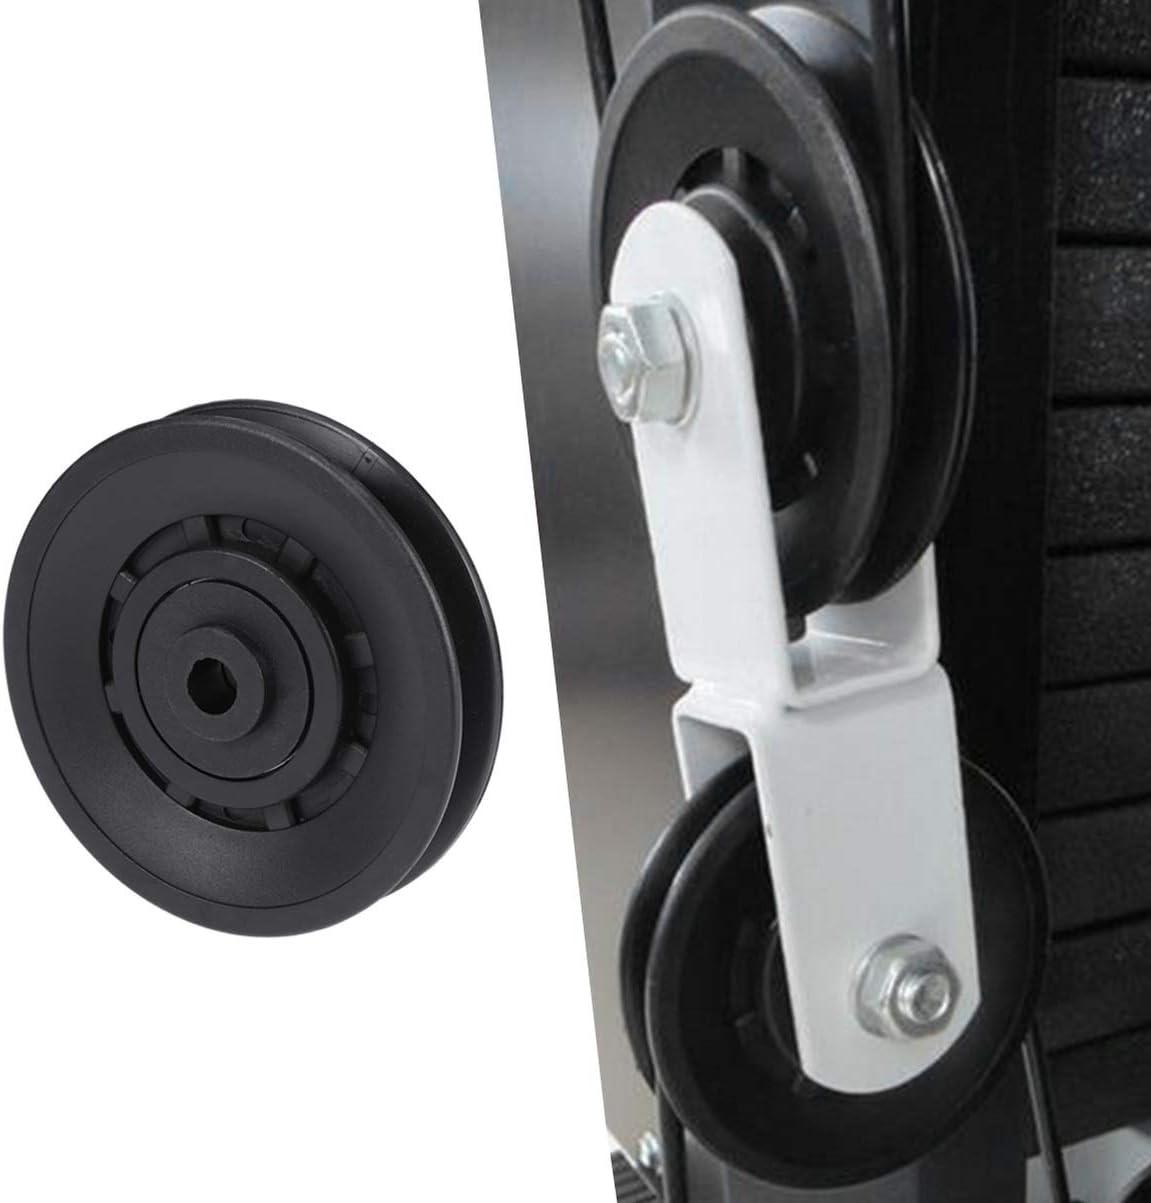 Fitness Lager Riemenscheibe Umlenkrolle für Fitness-Armtrainingsgerät,